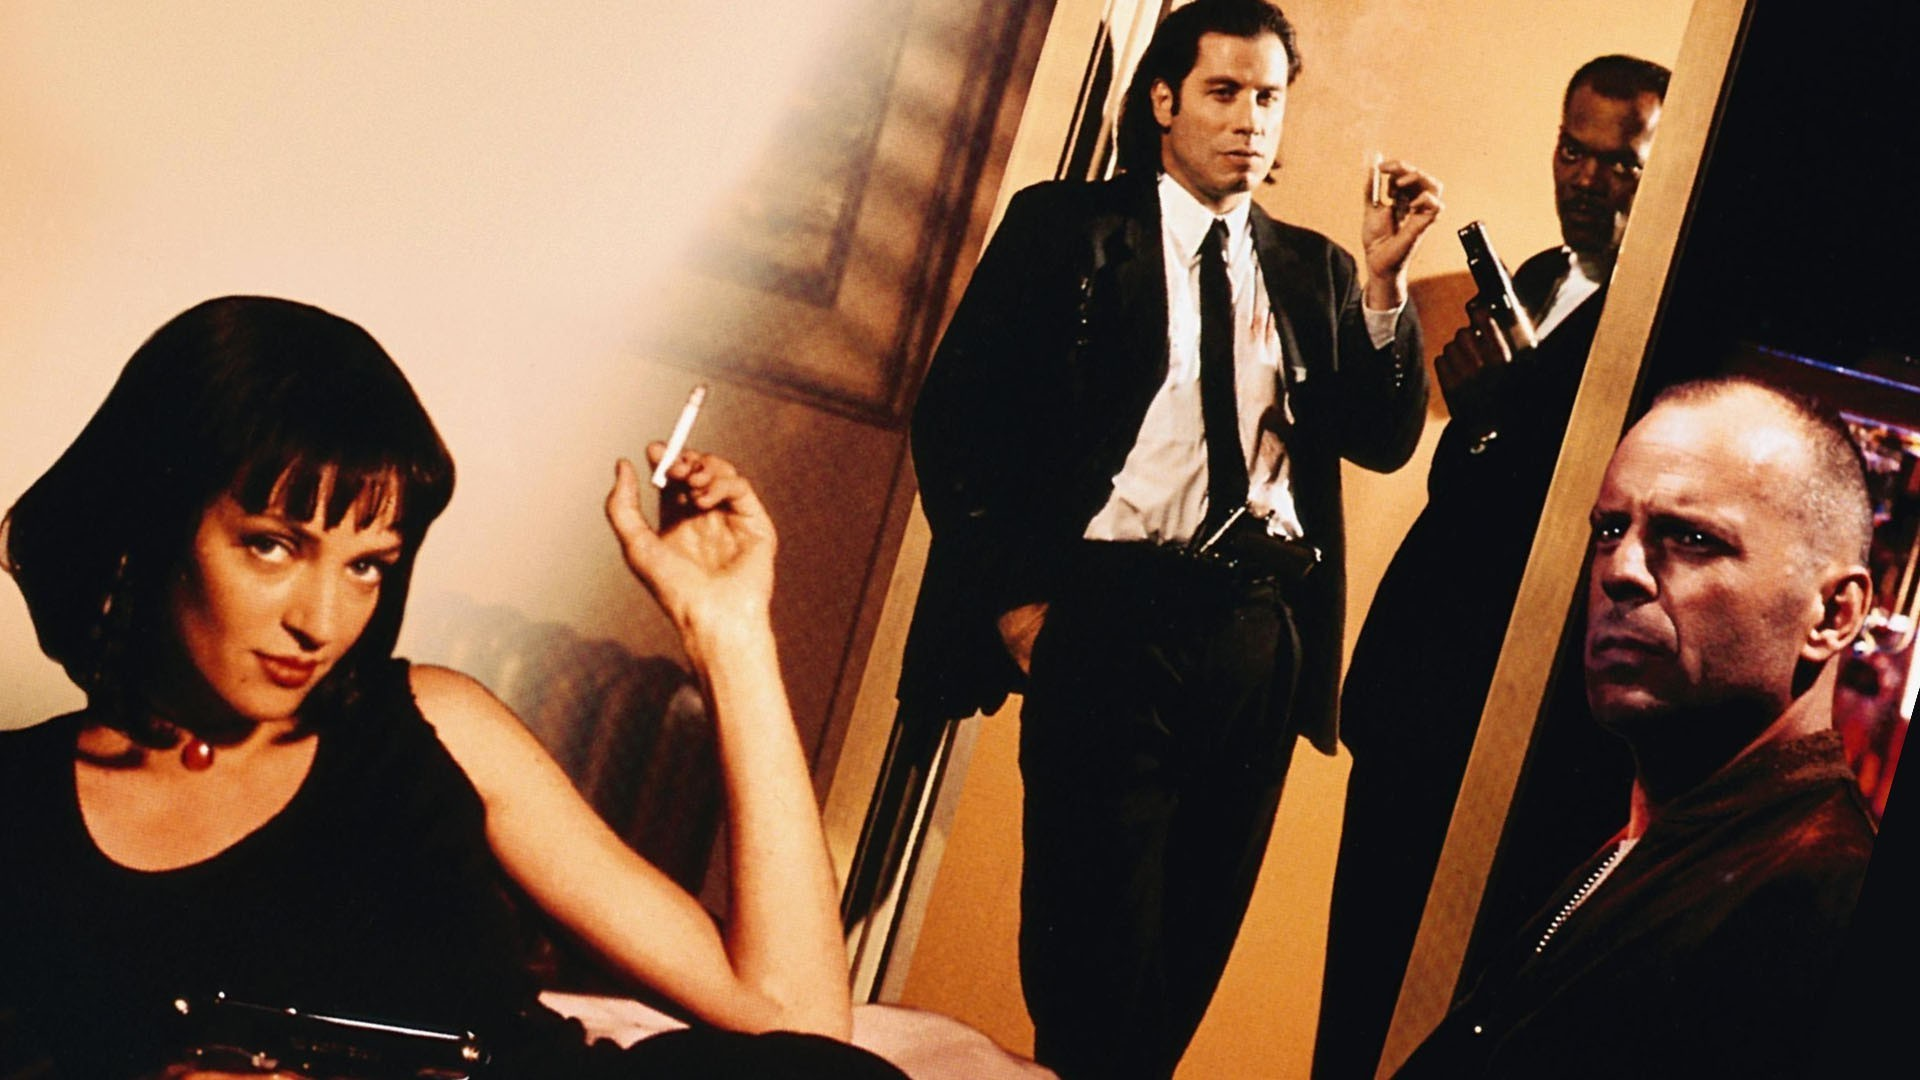 movies, Pulp Fiction, Uma Thurman, Bruce Willis, Samuel L. Jackson, John  Travolta Wallpapers HD / Desktop and Mobile Backgrounds